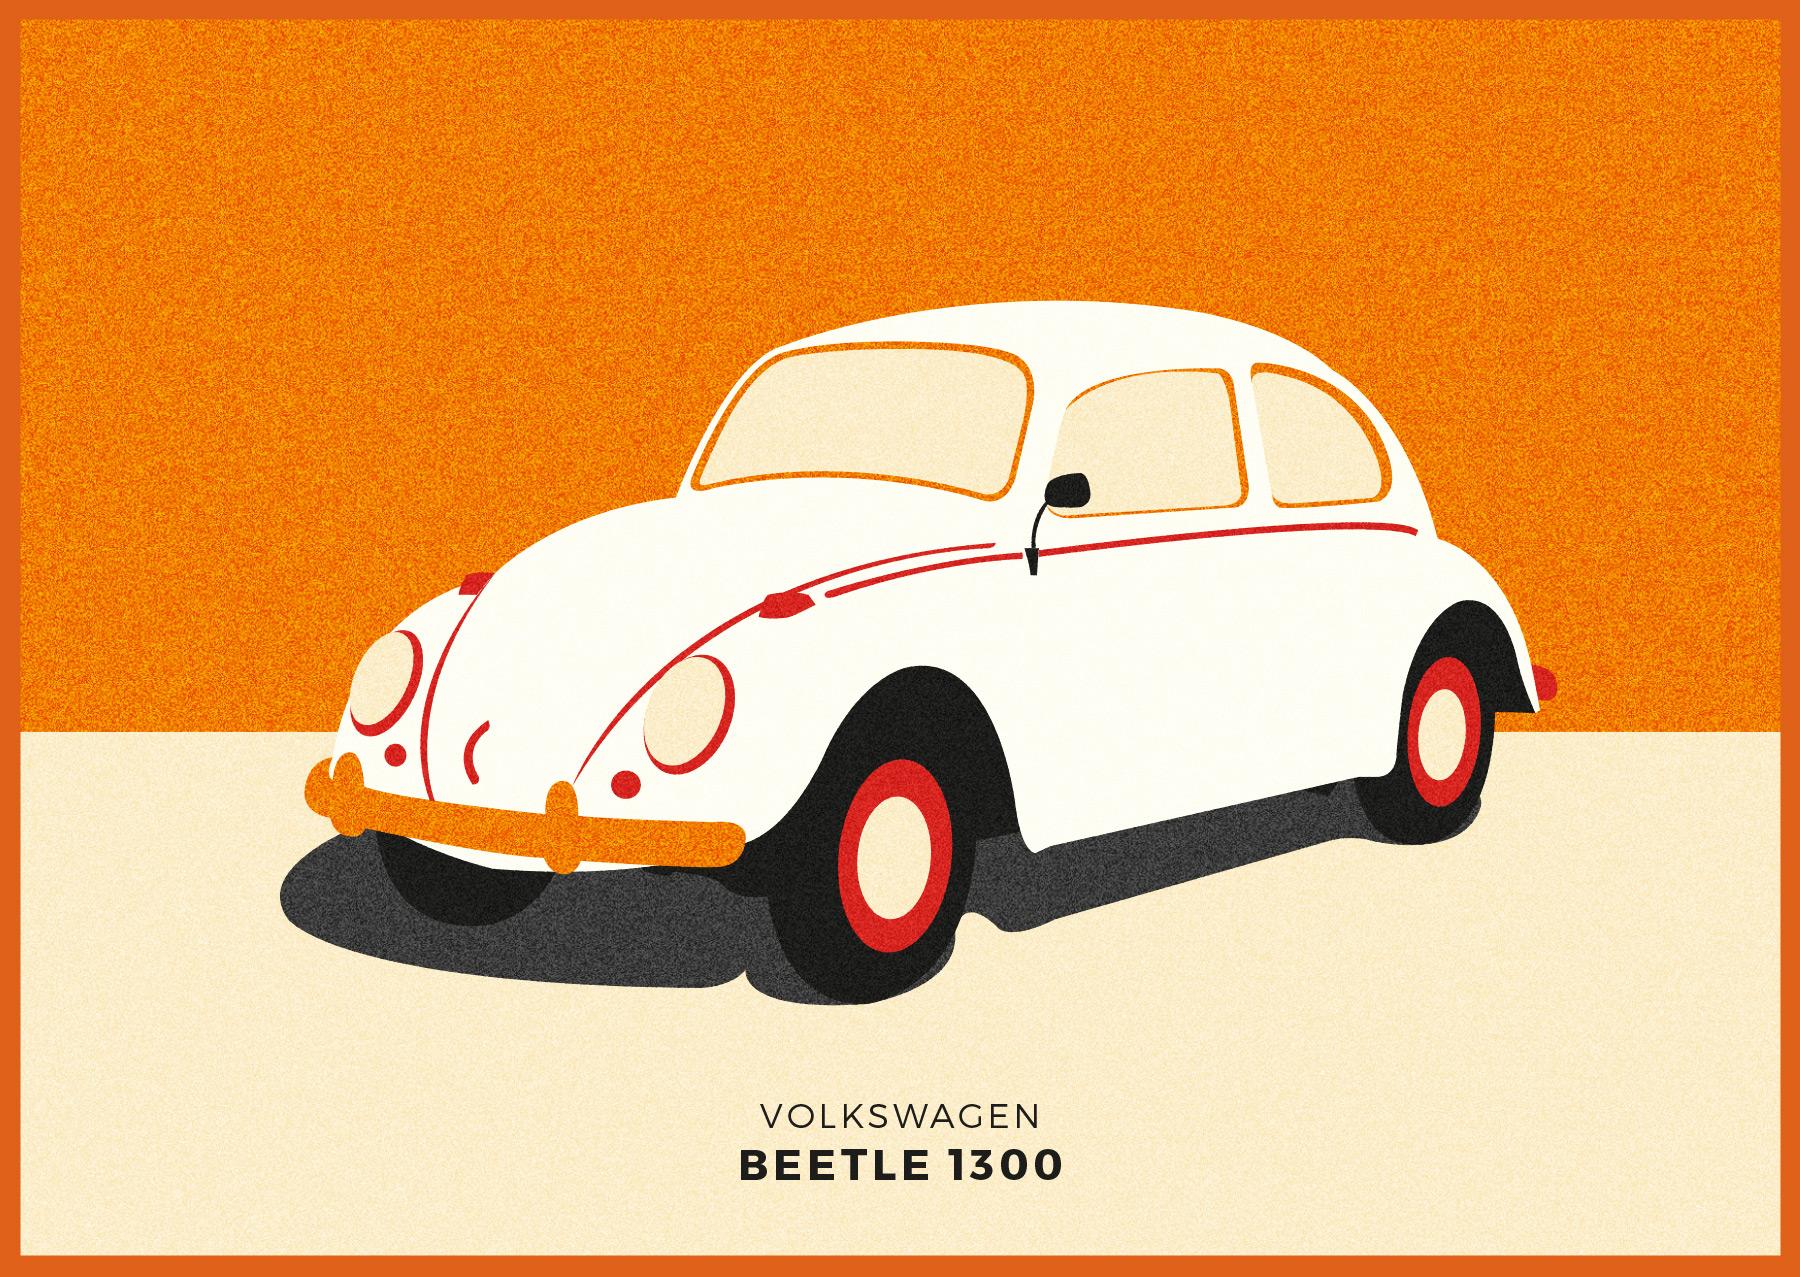 Carole_Chevalier-Iconic-cars-6.jpg